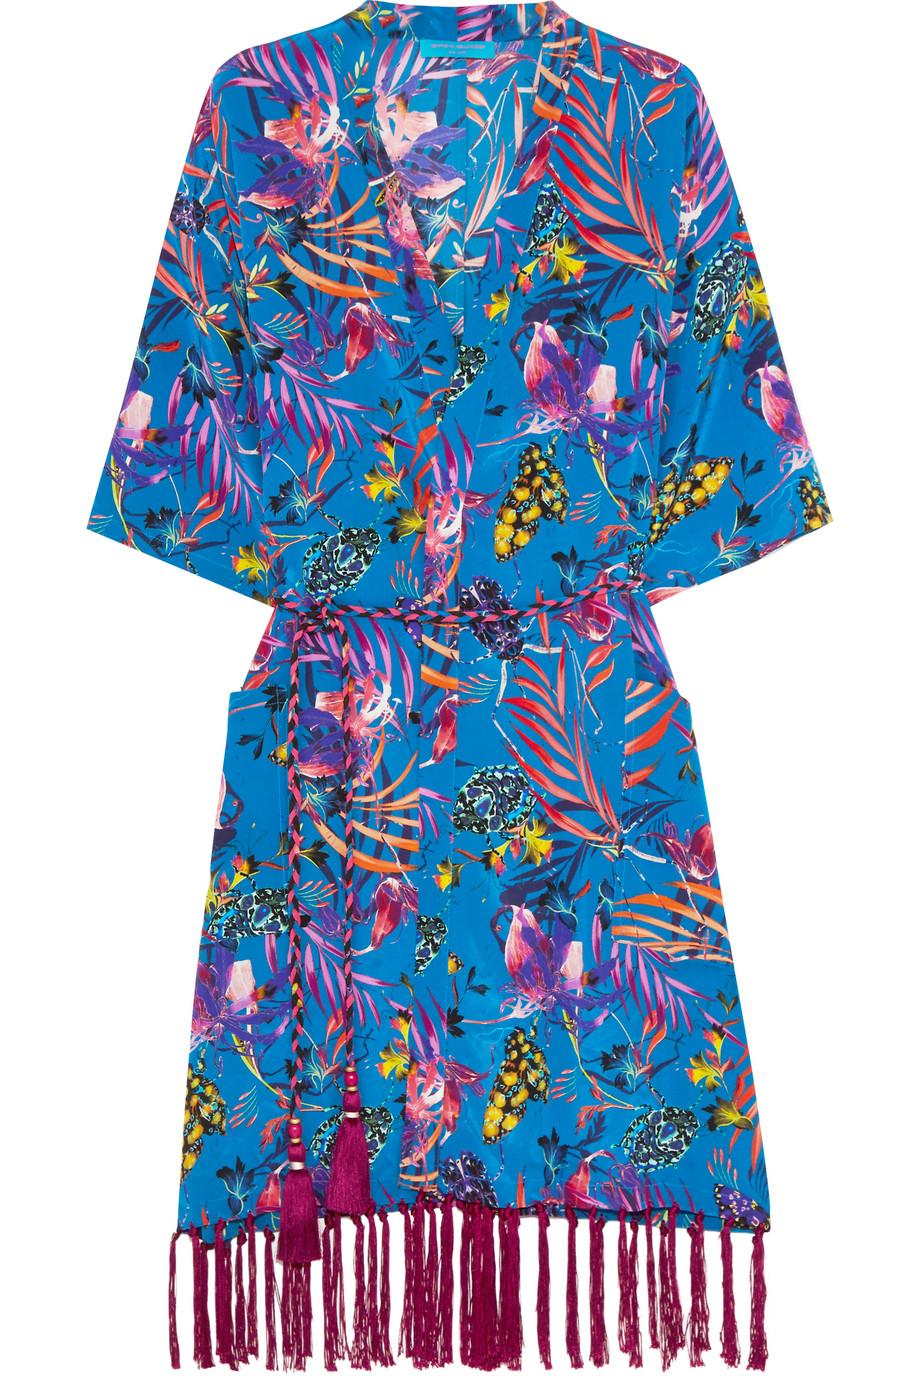 Tasseled Printed Silk Crepe De Chine Kimono, Matthew Williamson, Royal Blue, Women's, Size: 10